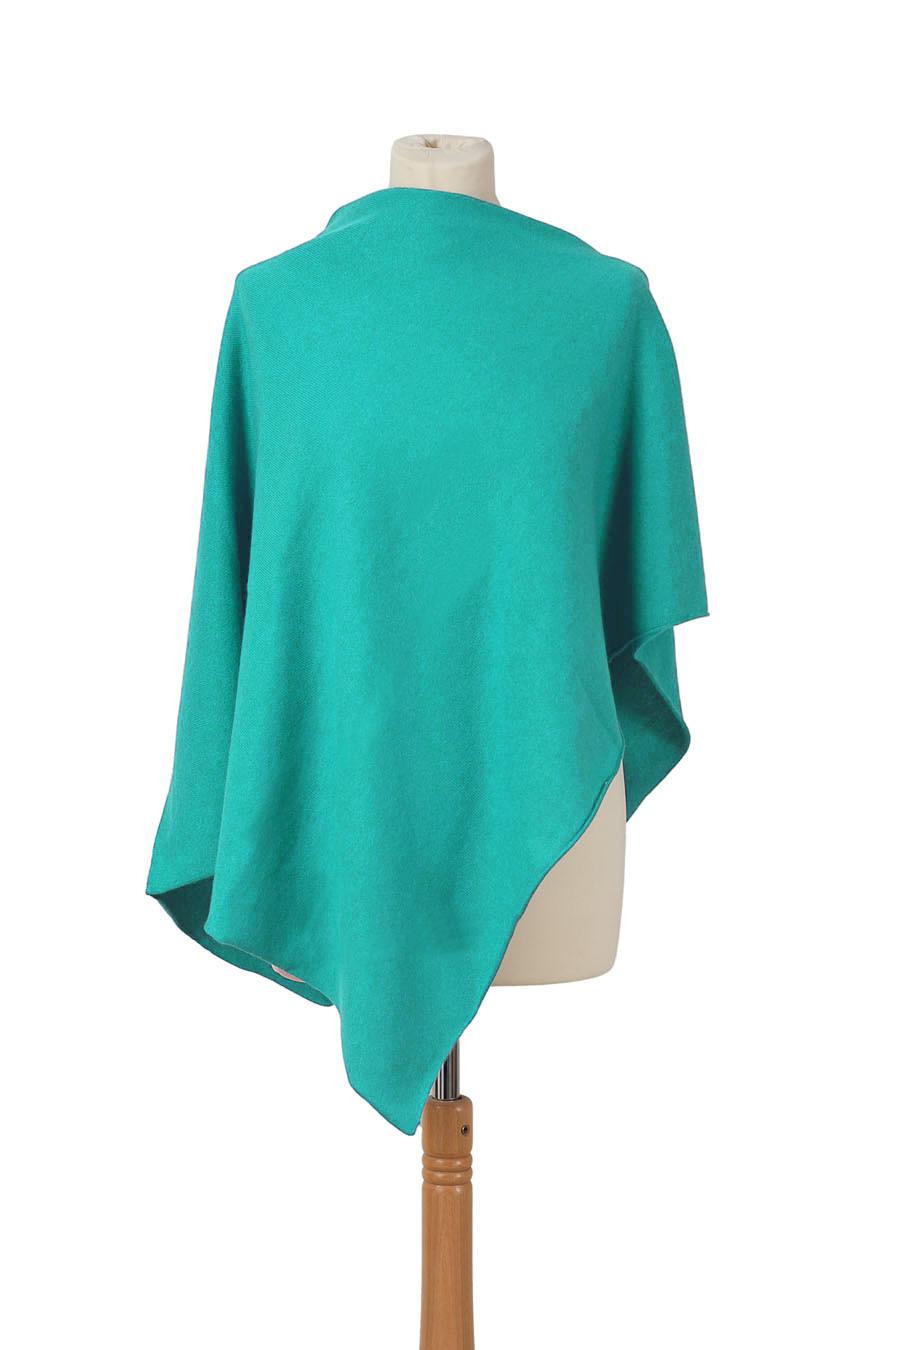 Poncho cachemire TANGA Turquoise